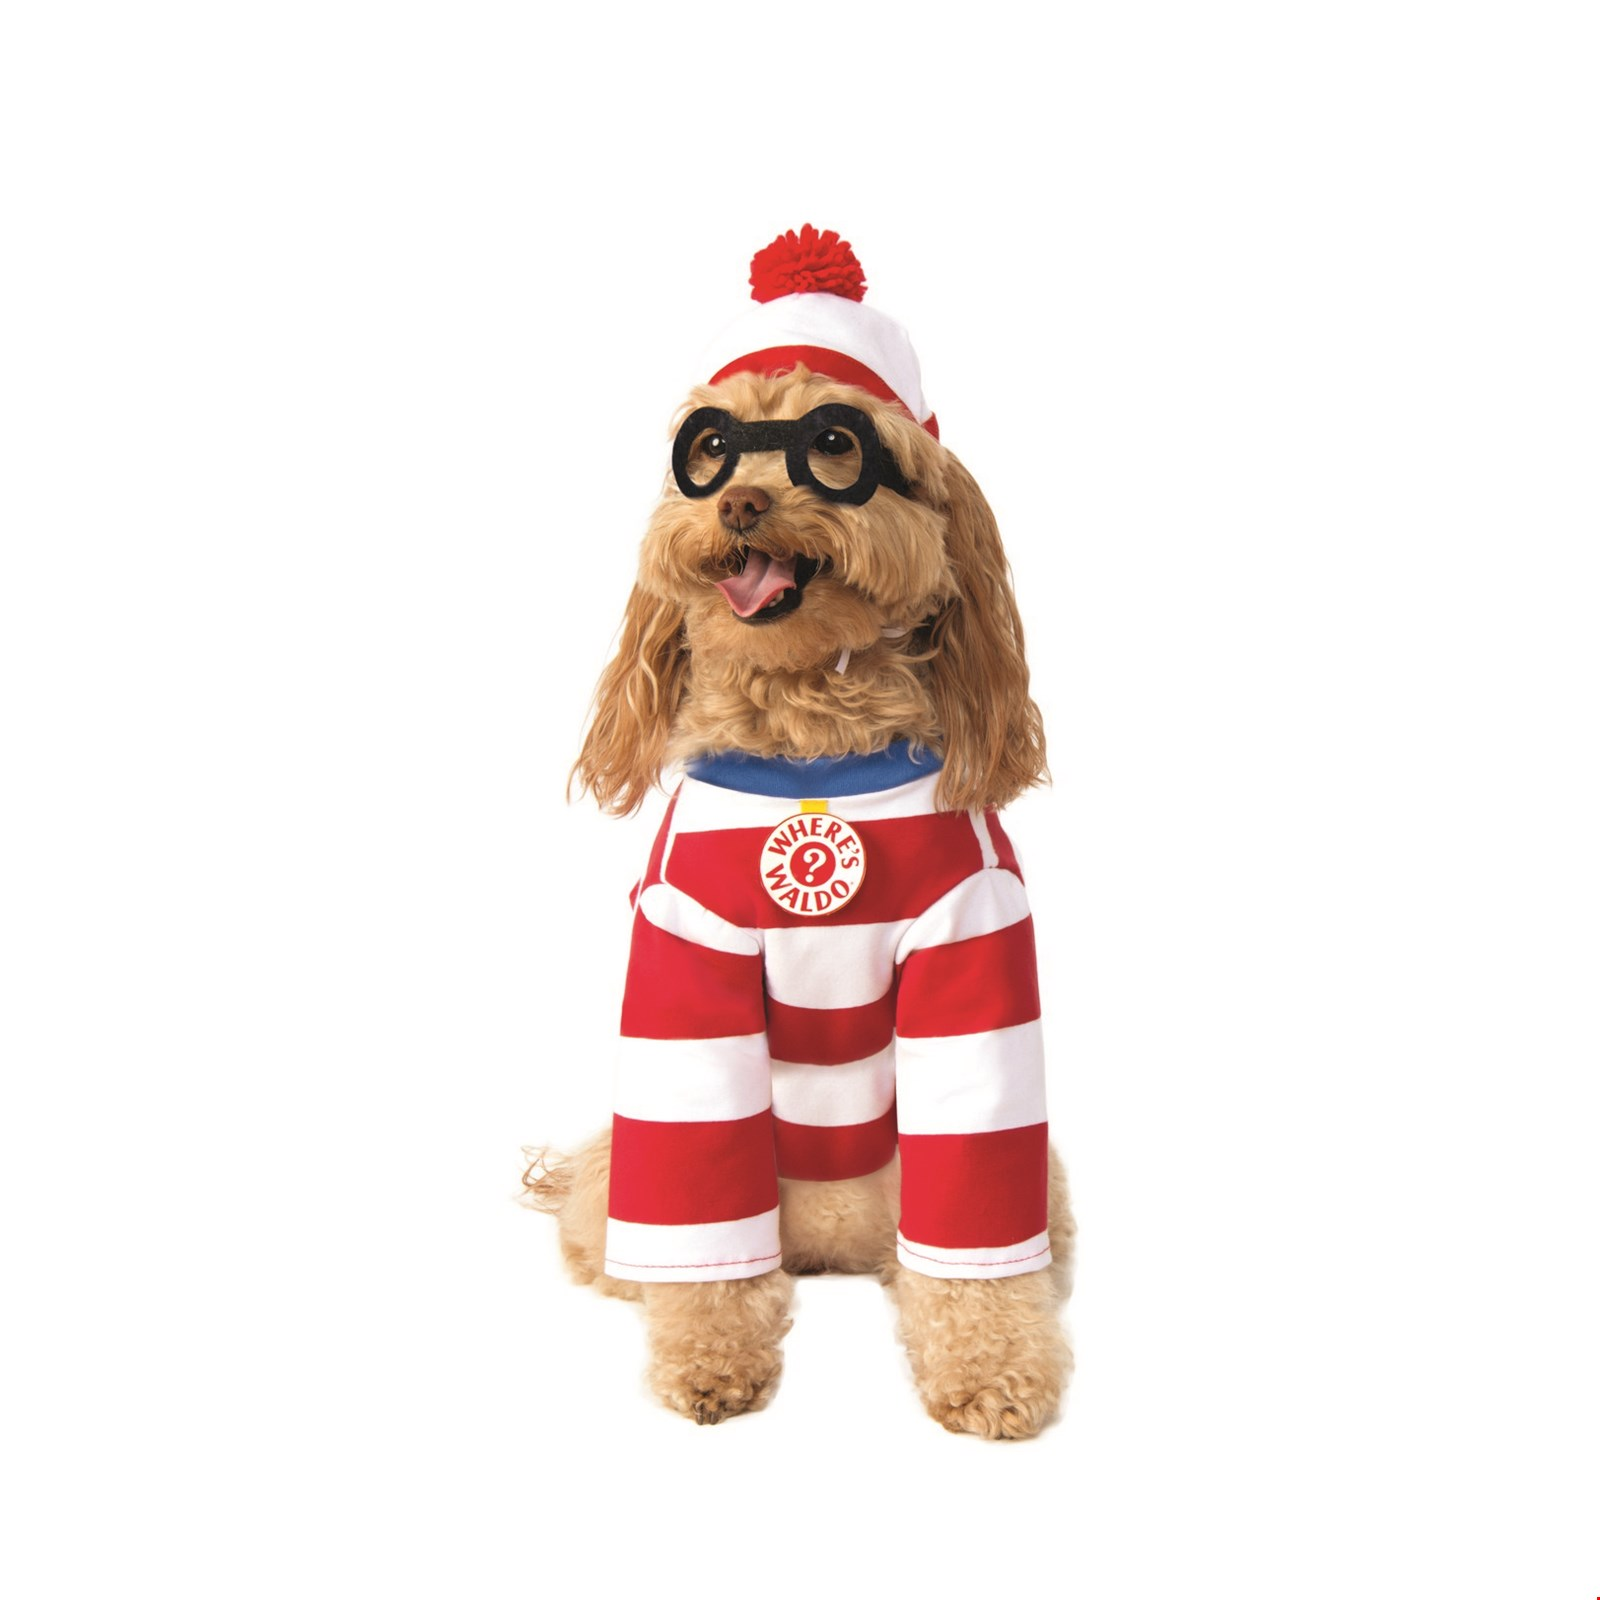 Where's Waldo Woof Dog Costume